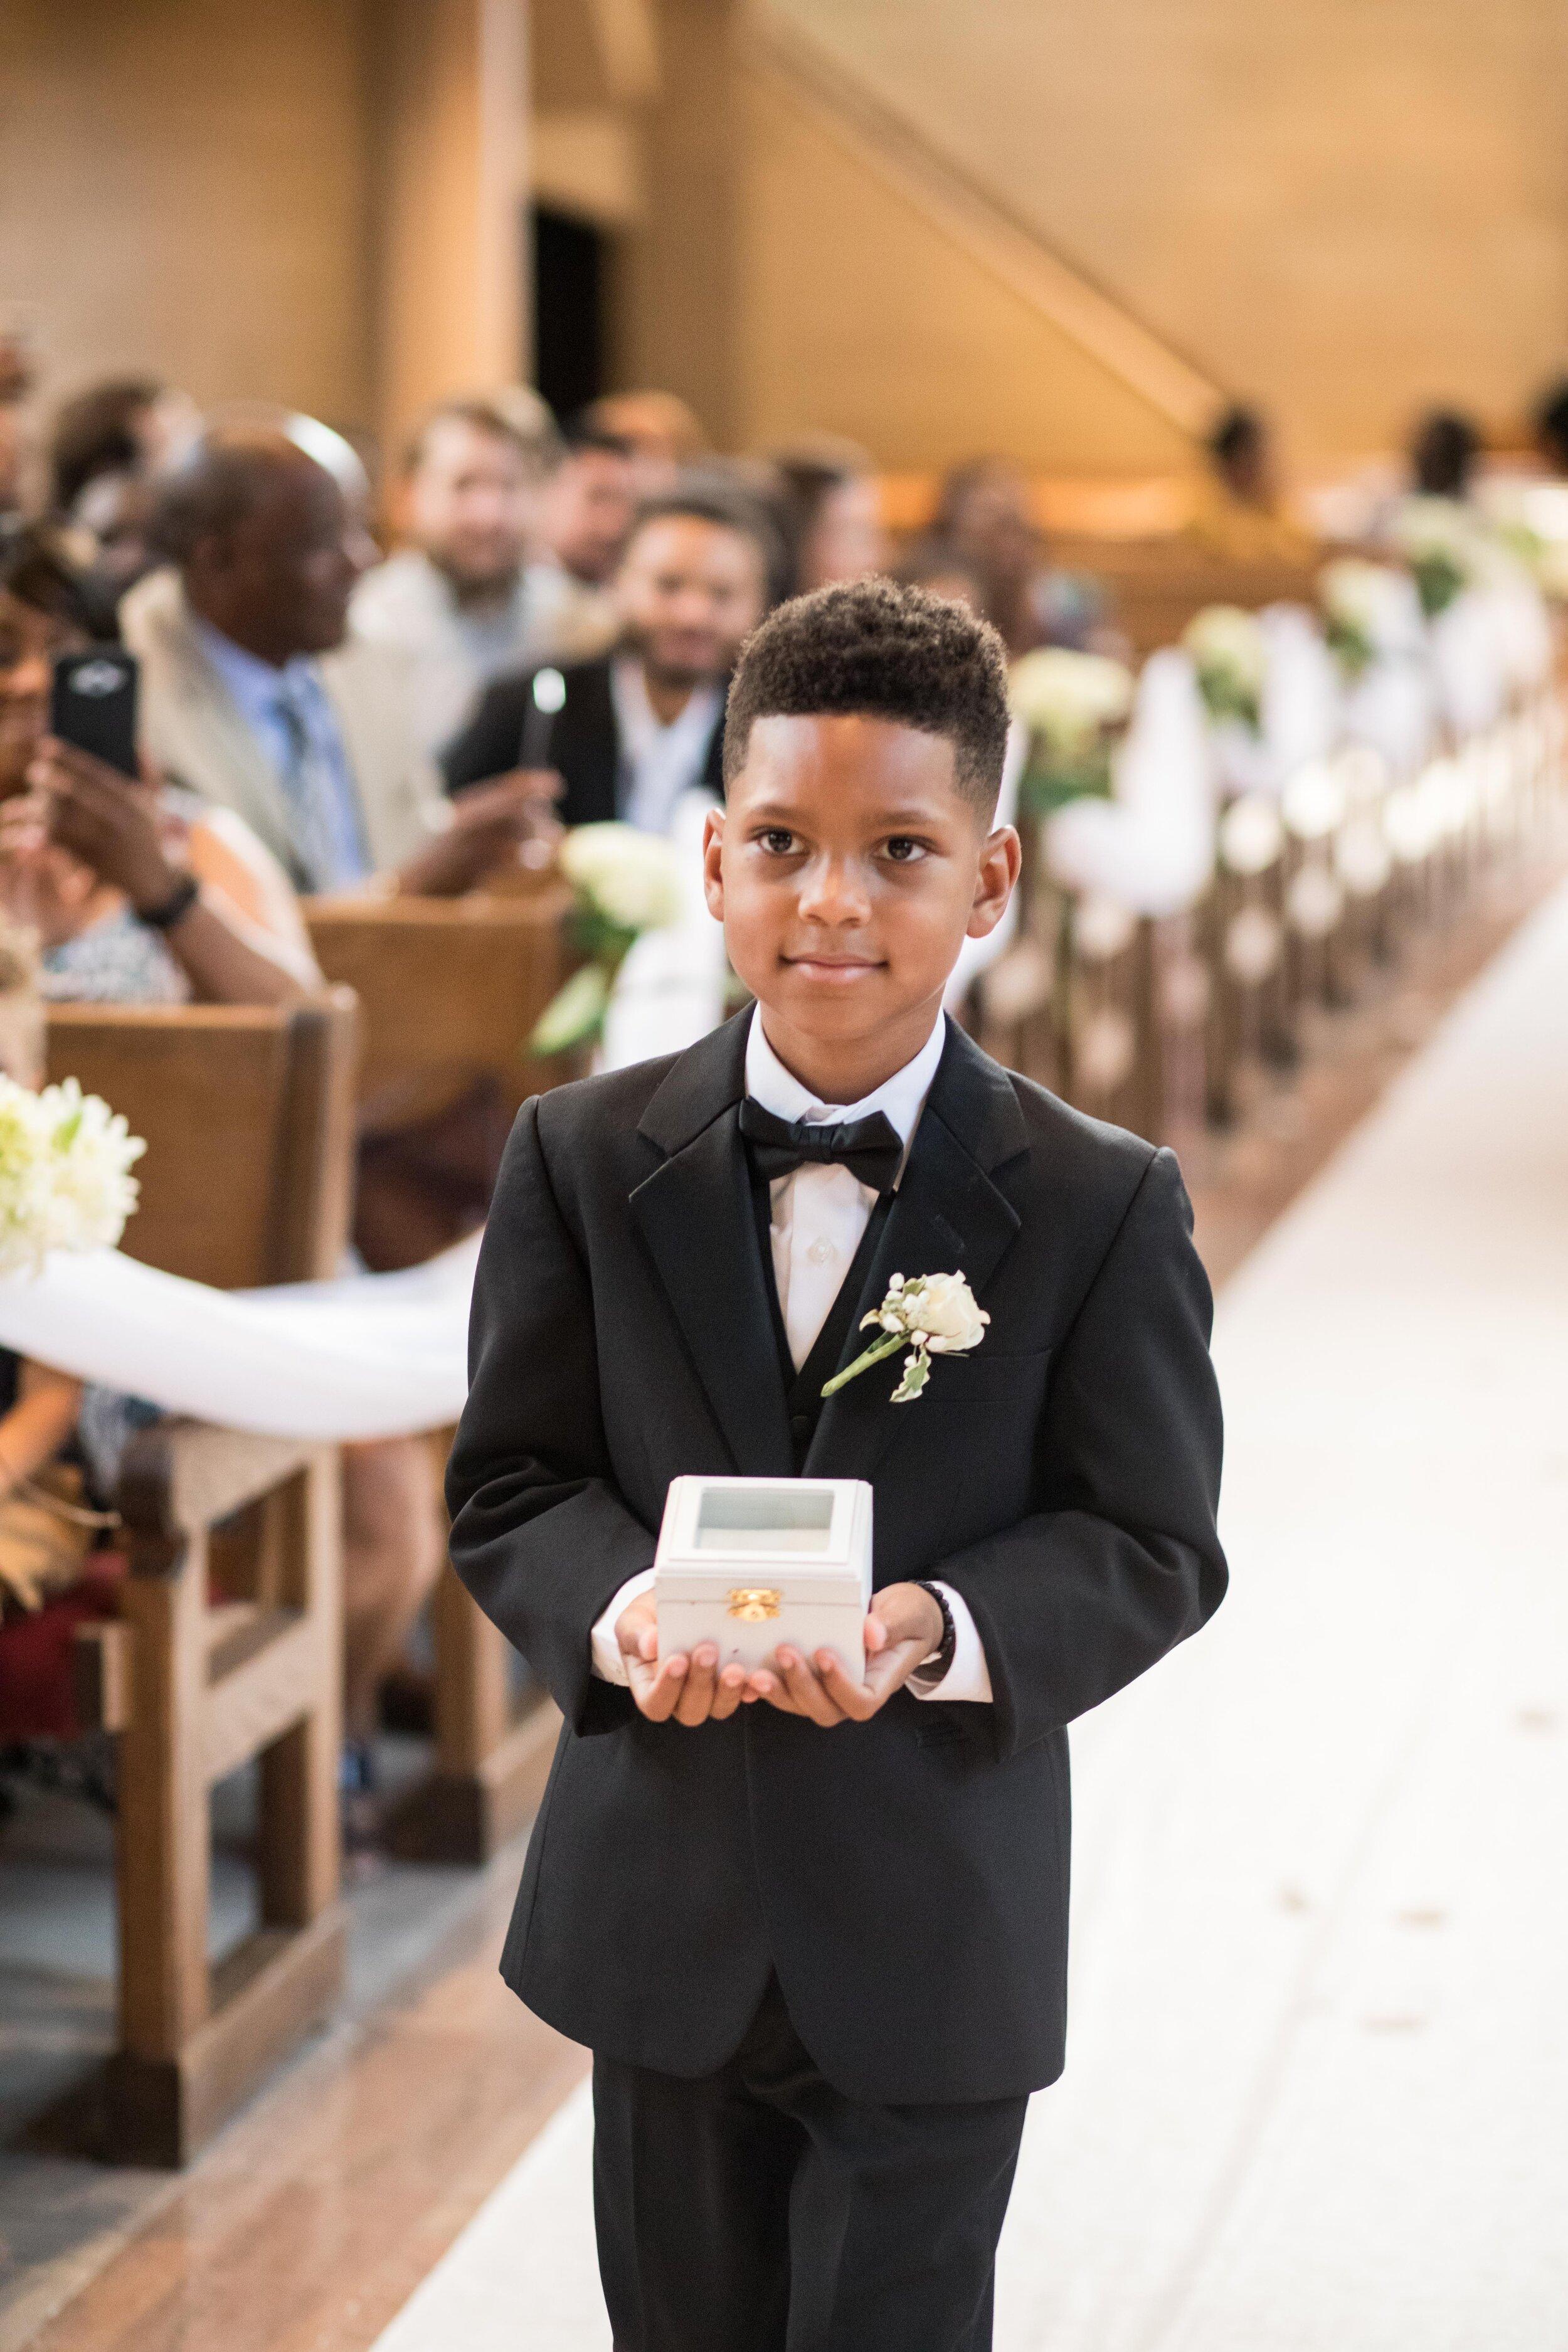 8_3_2019_BONTY_WEDDING-290.jpg